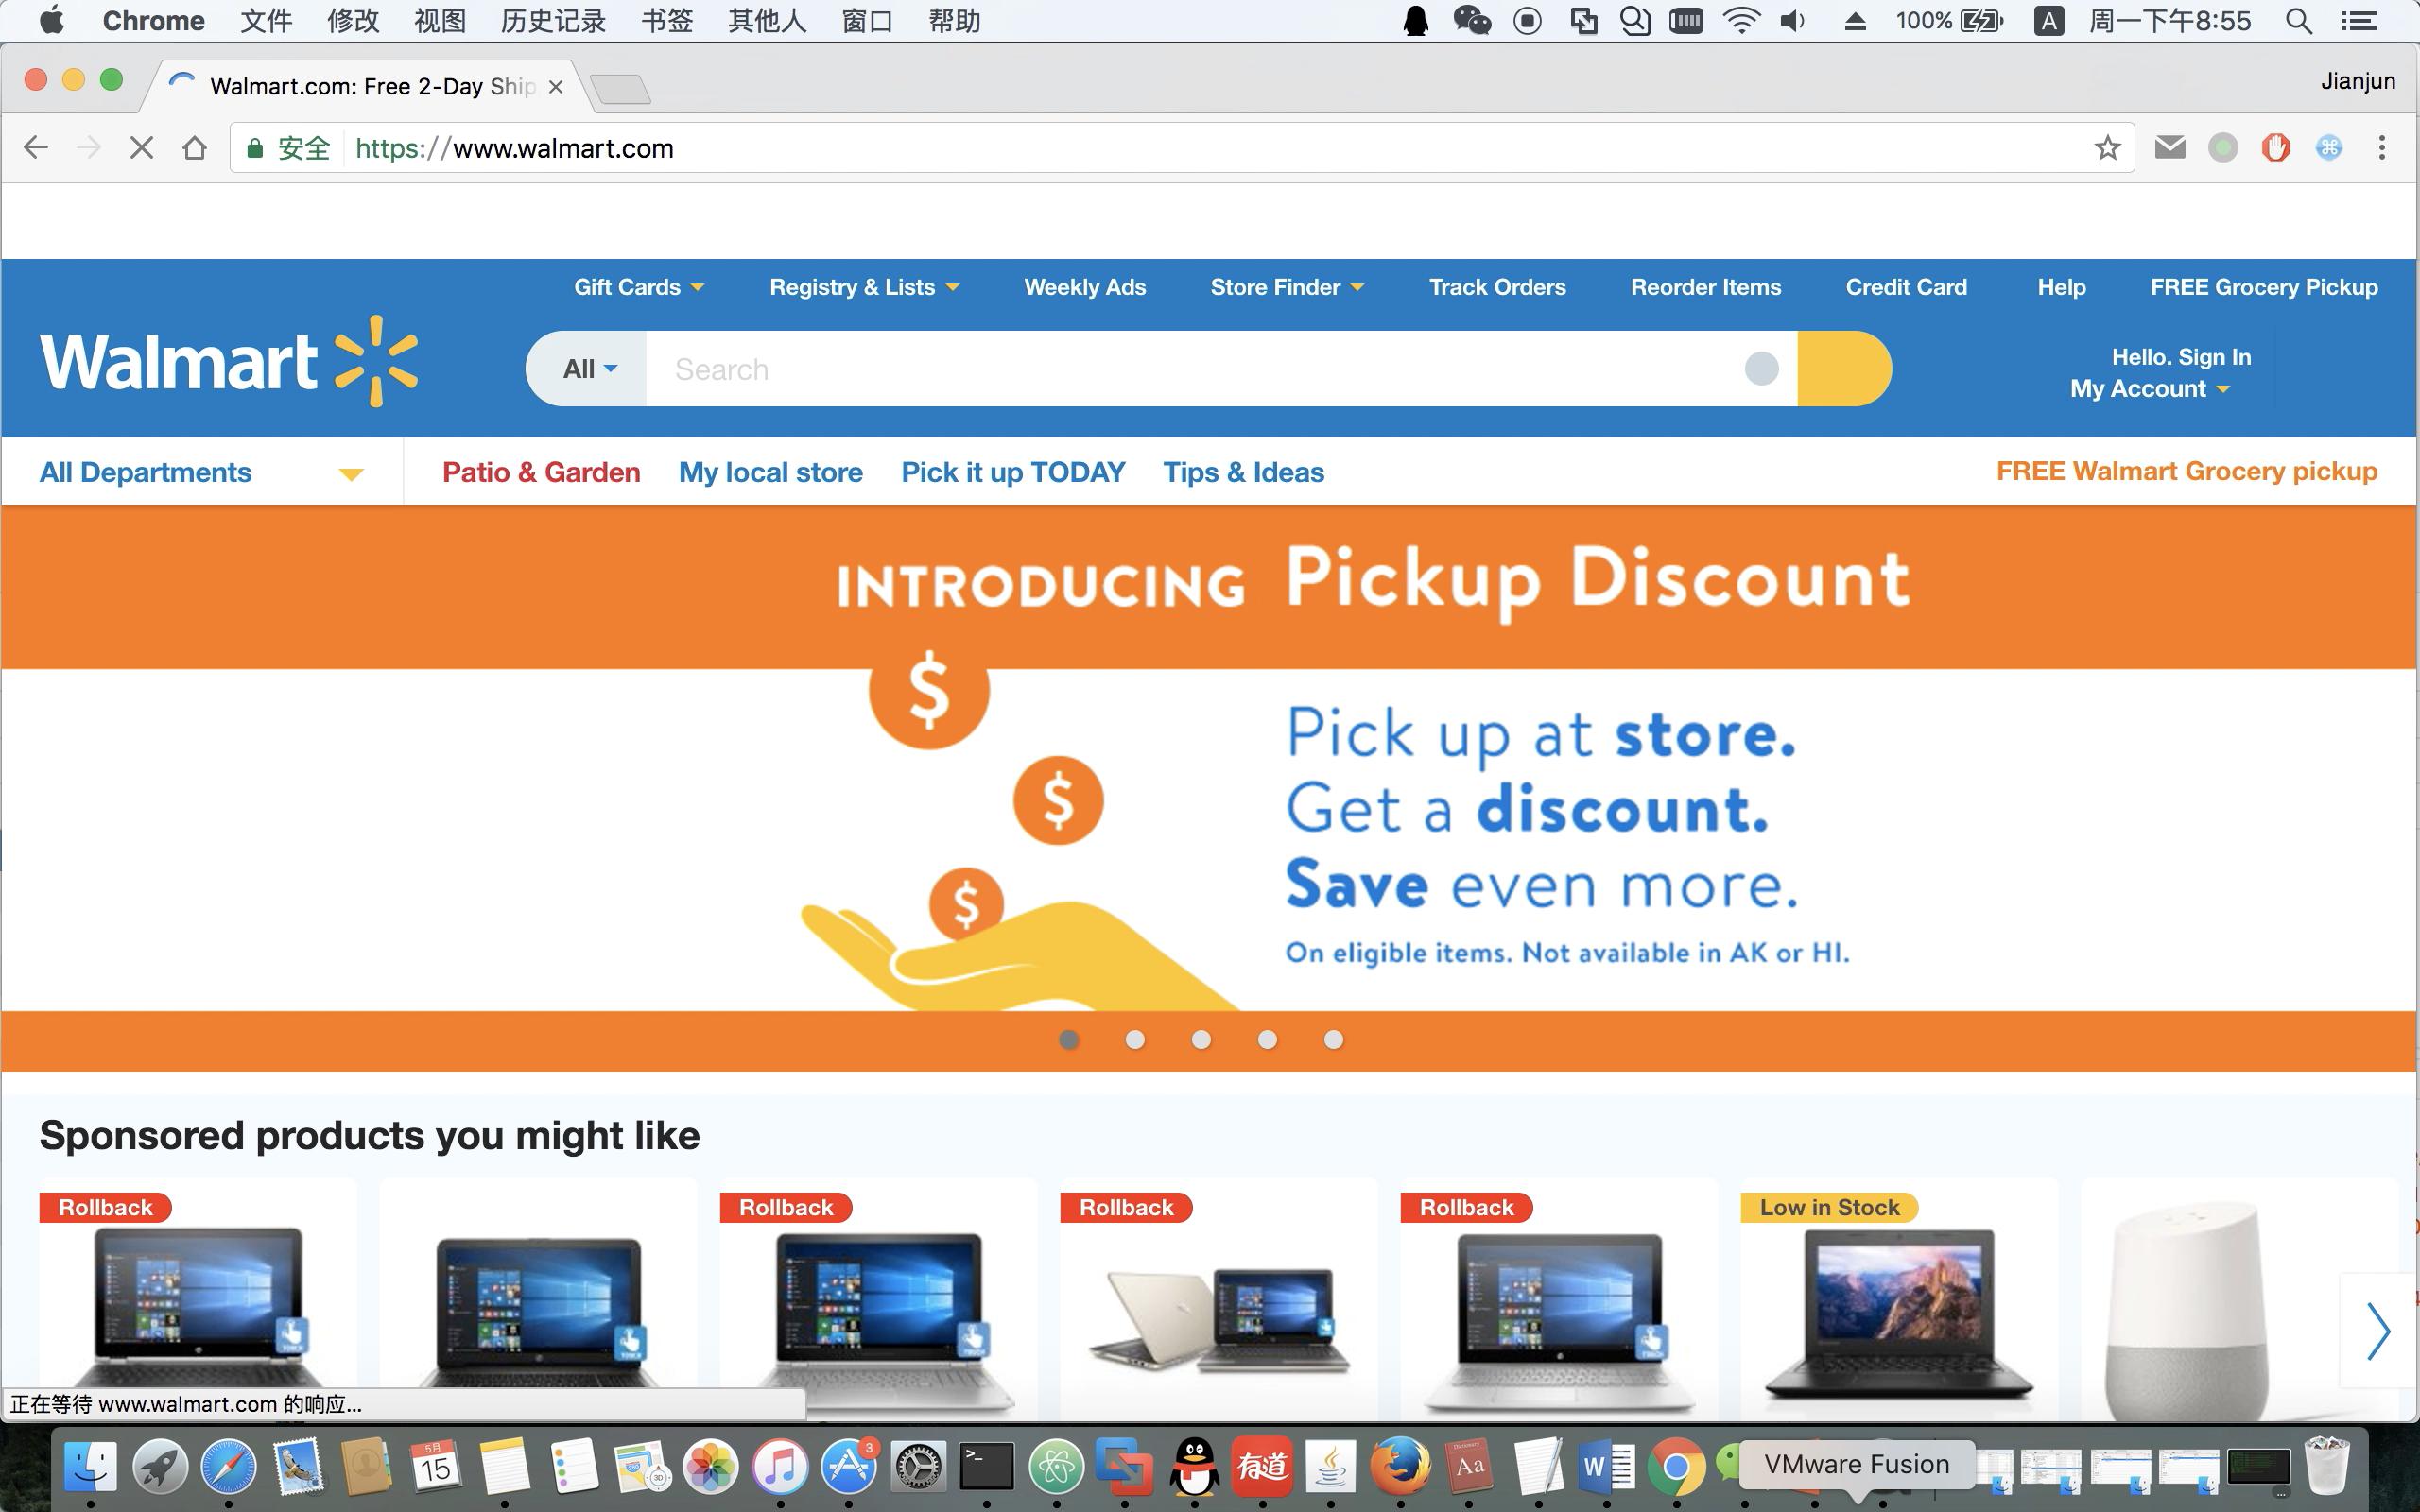 Walmart_CORS_misconfiguration_exploitation